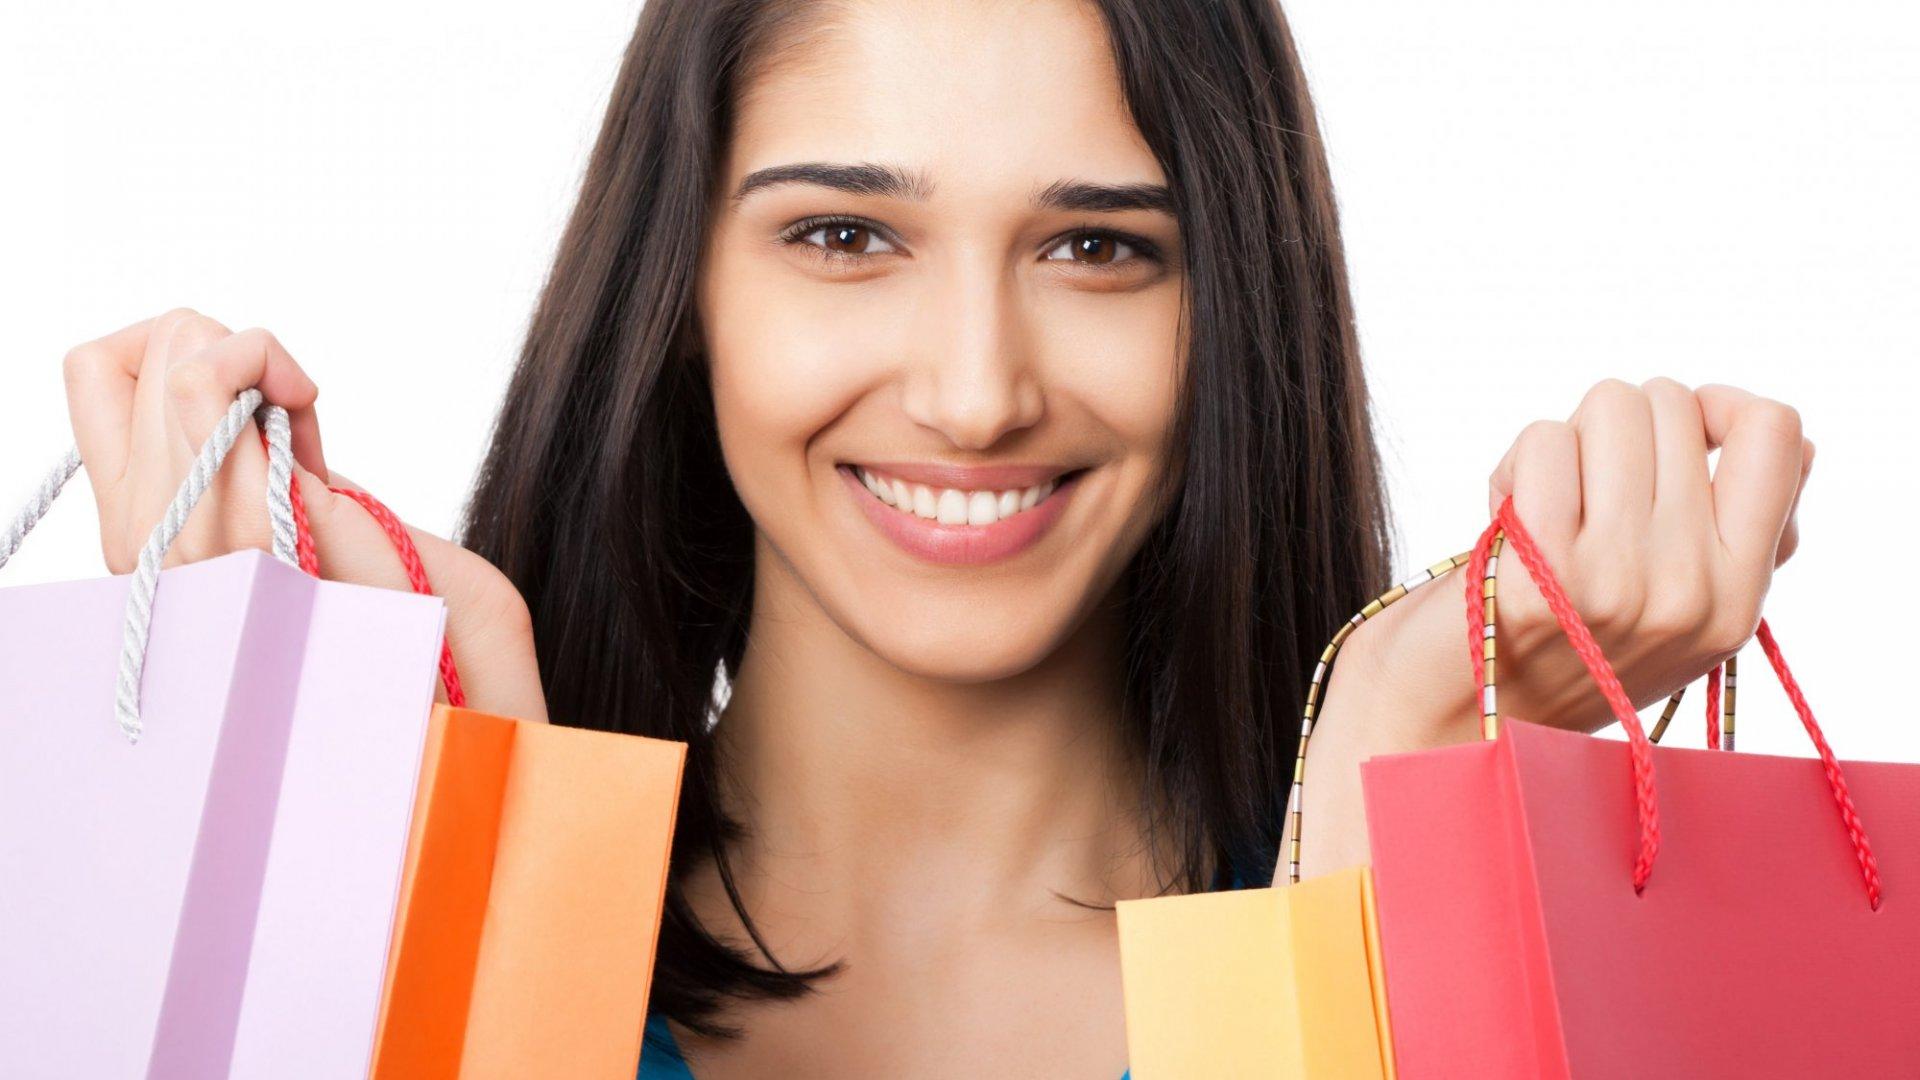 10 Ways to Build Lifelong Customer Loyalty